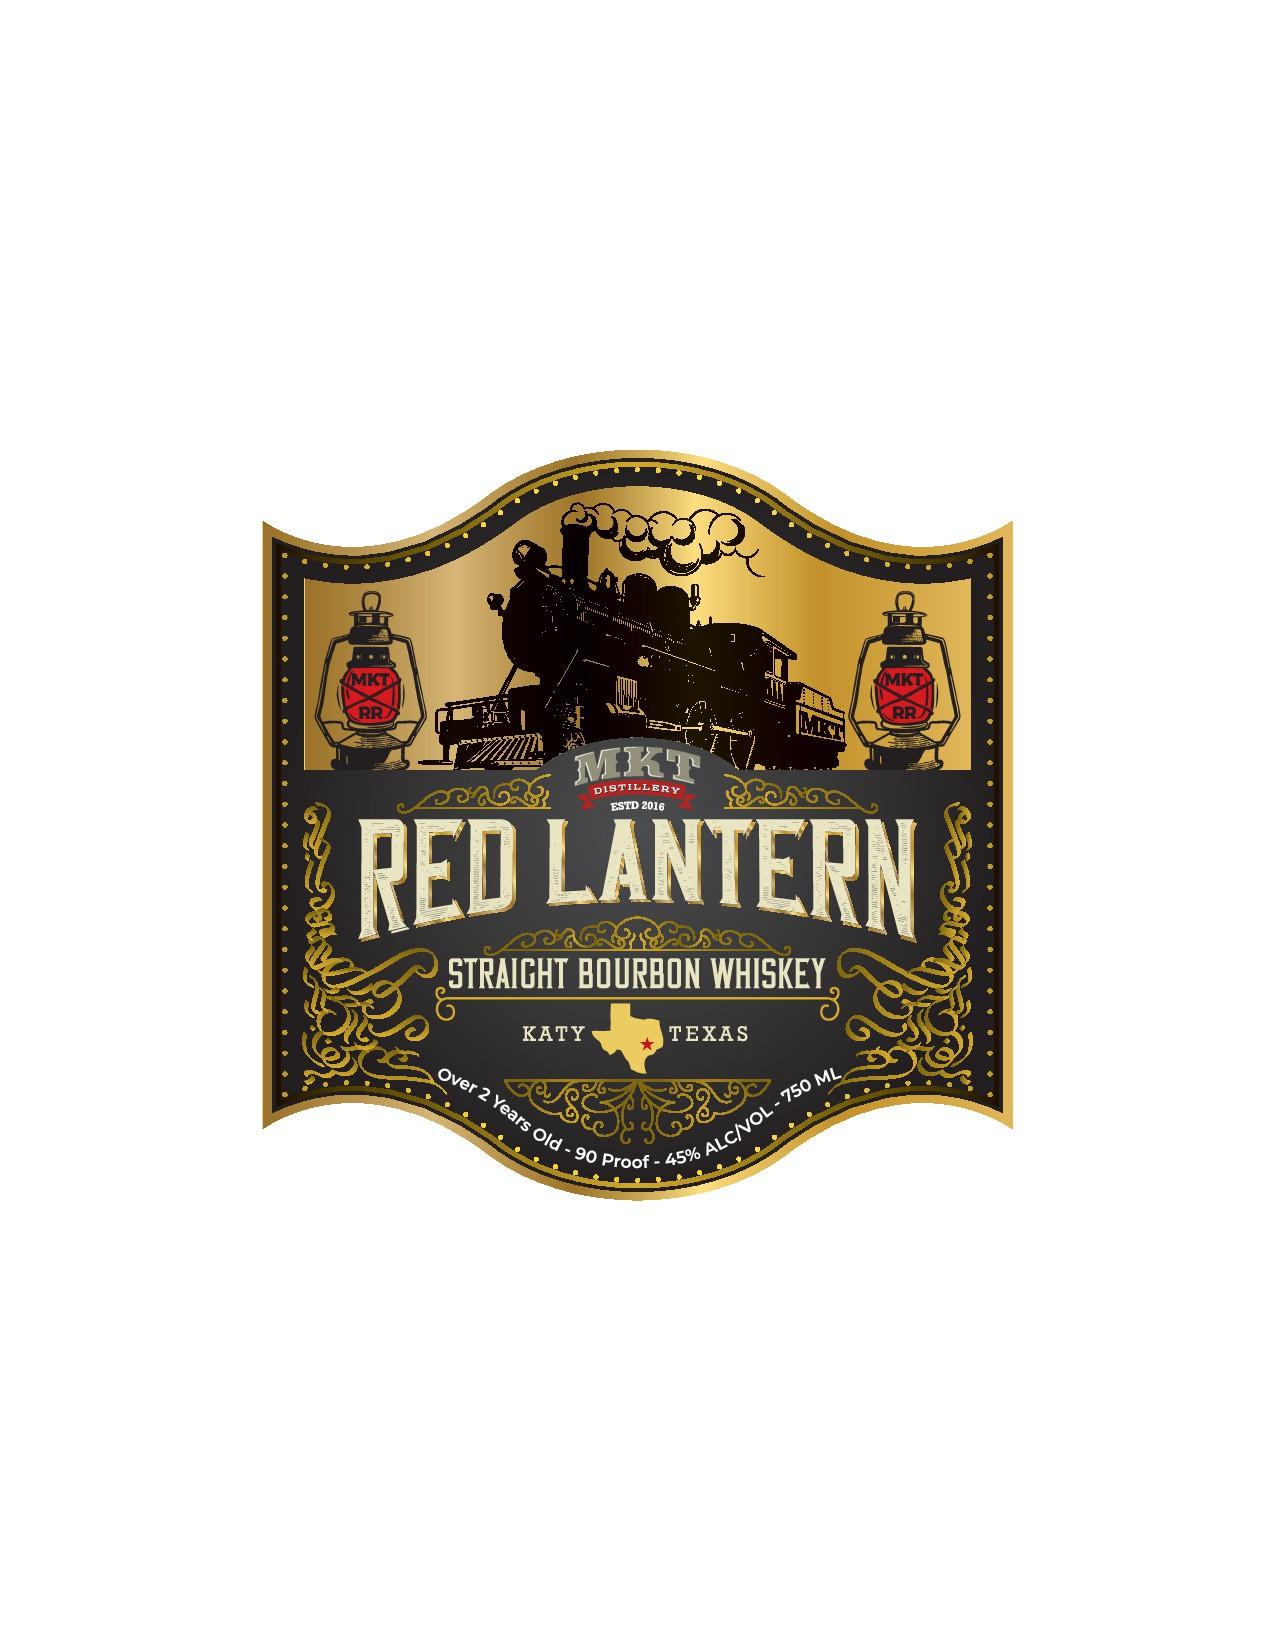 Red Lantern Bourbon Label